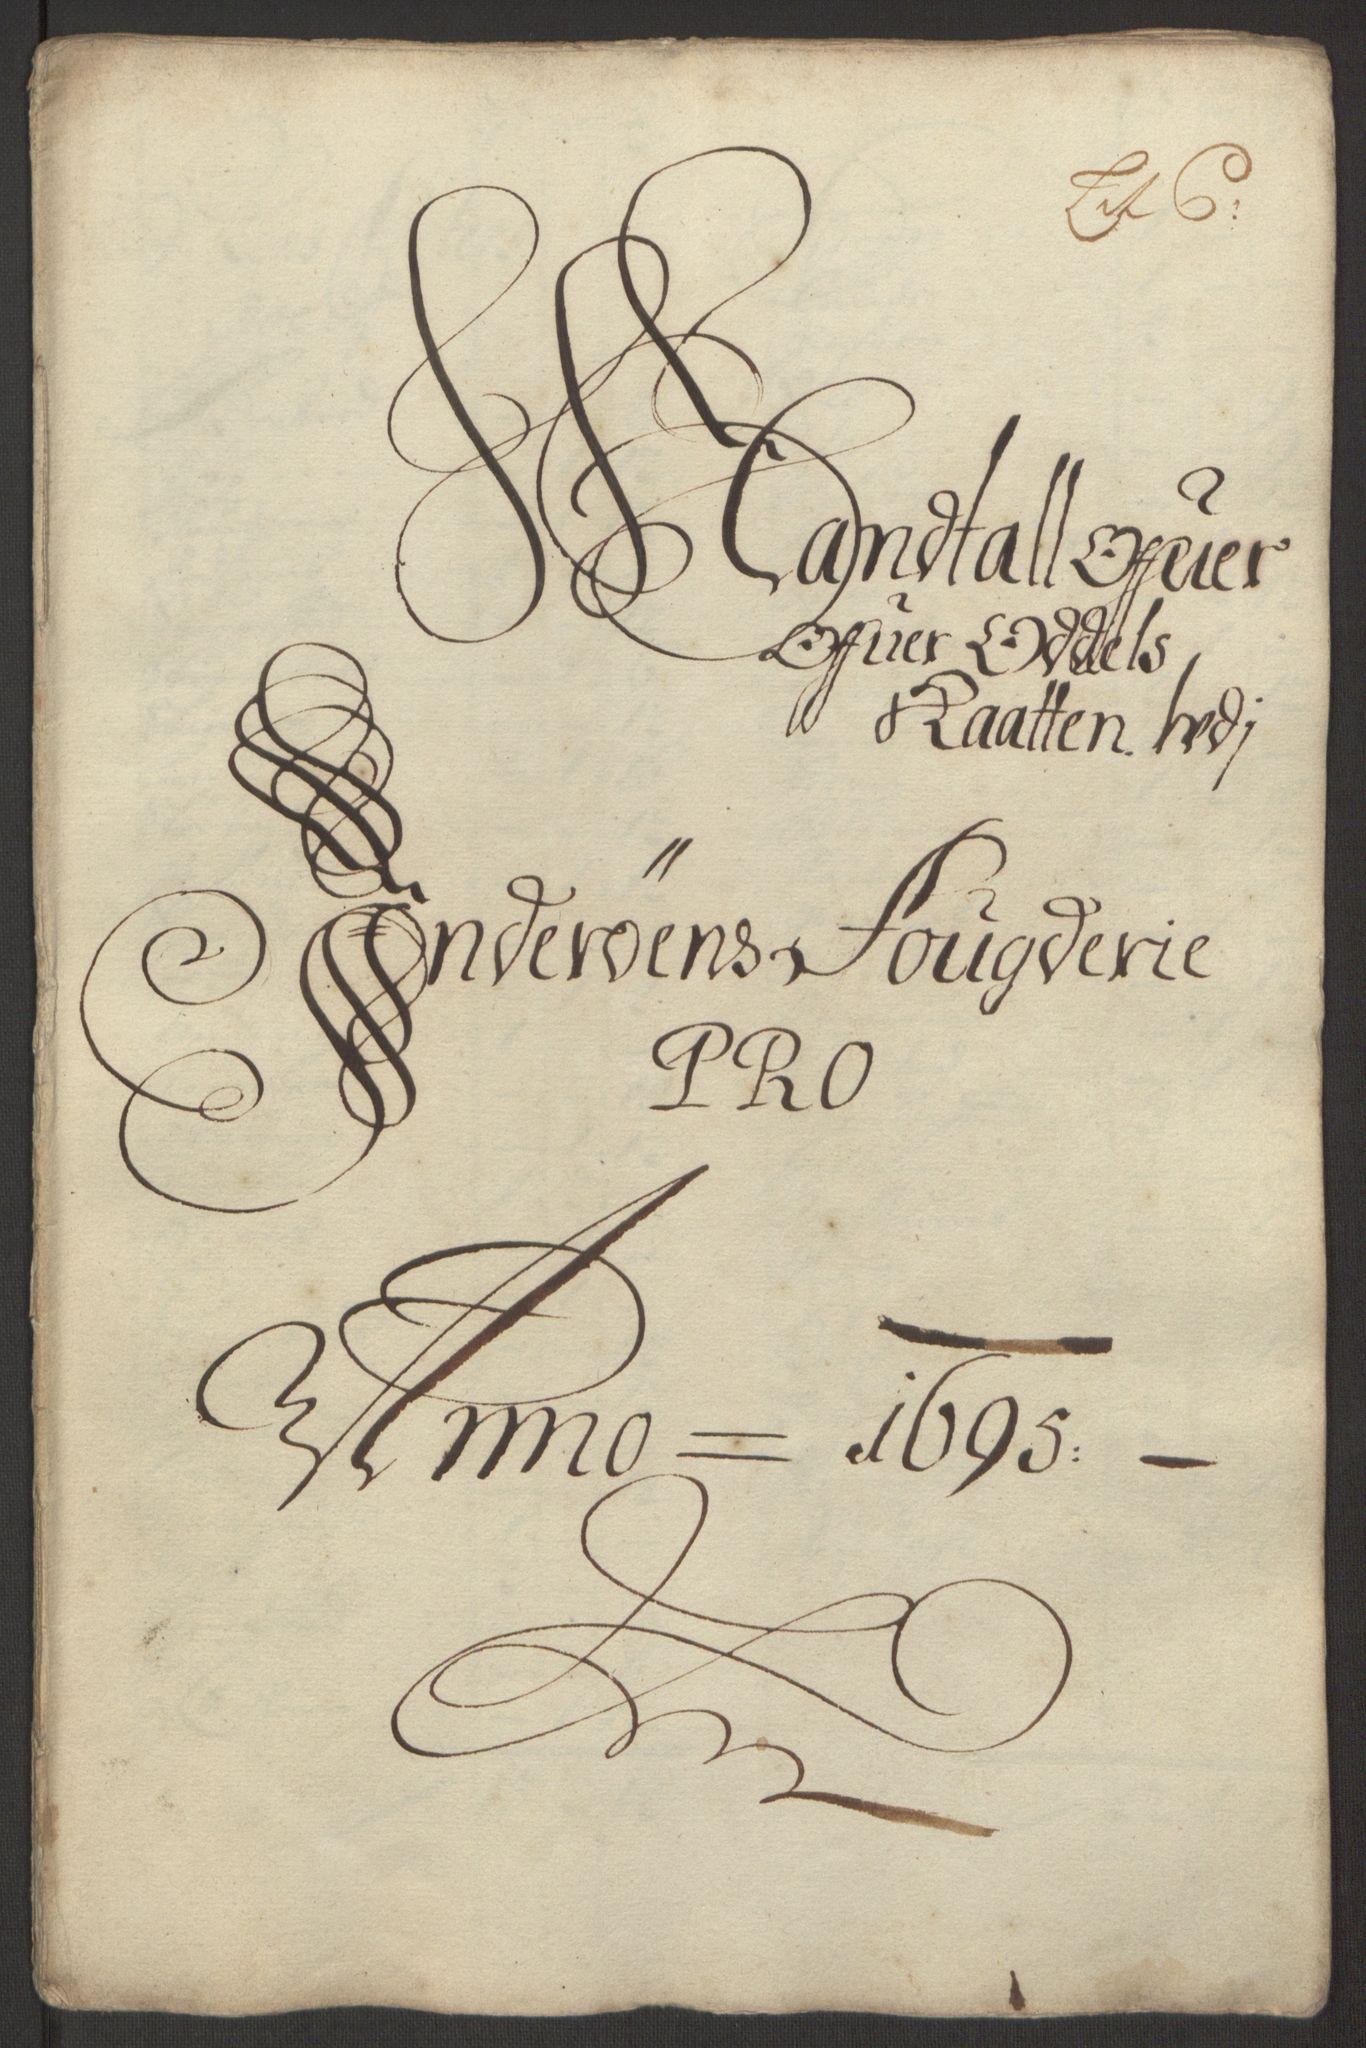 RA, Rentekammeret inntil 1814, Reviderte regnskaper, Fogderegnskap, R63/L4309: Fogderegnskap Inderøy, 1695-1697, s. 23